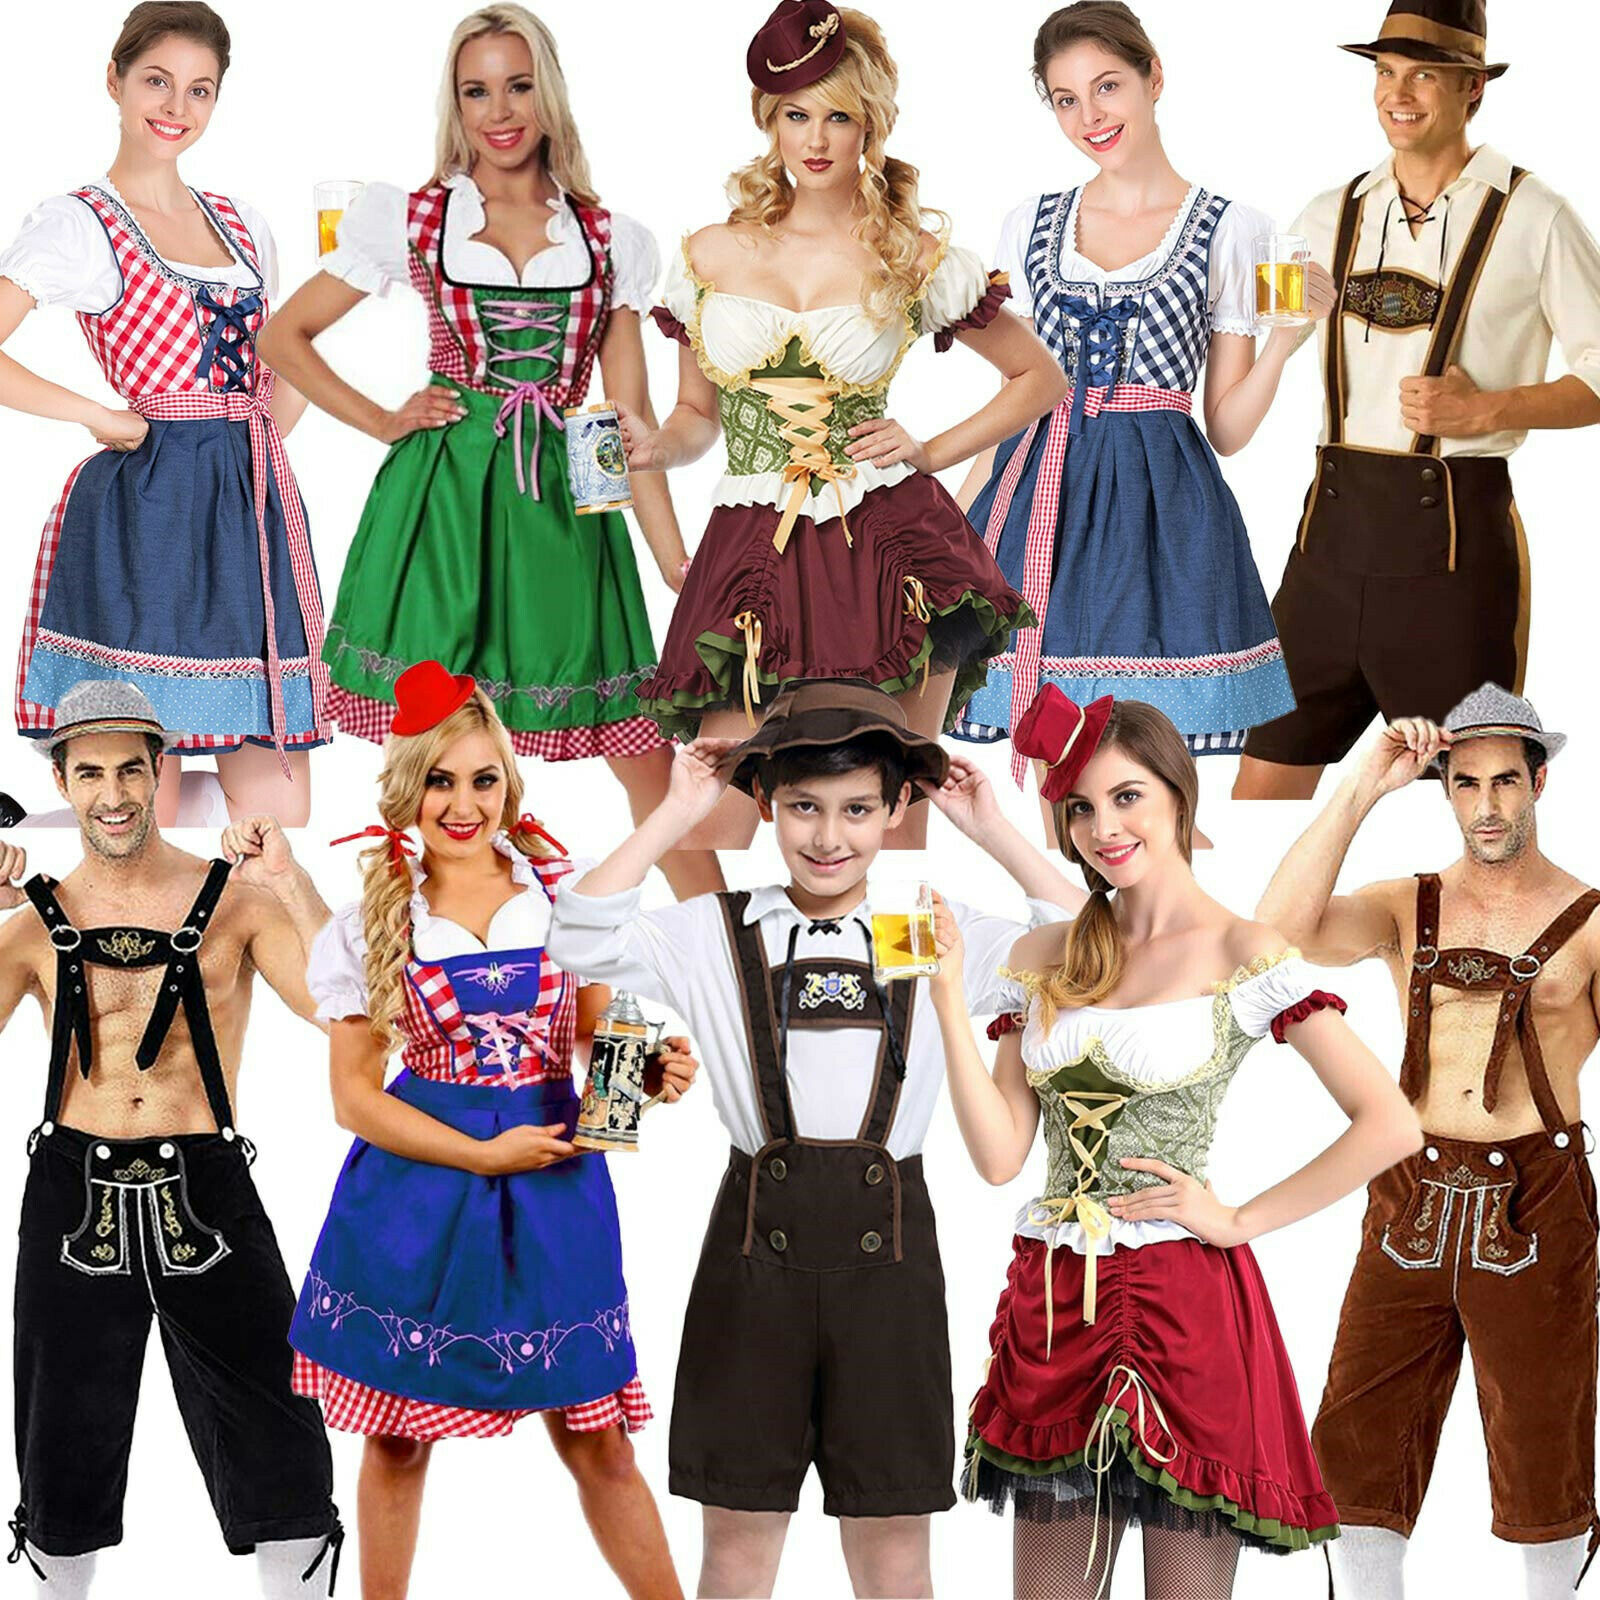 Trachtenkleid Damen Karneval Dirndl Kostüm Oktoberfest Trachtenmode Cosplay Neu